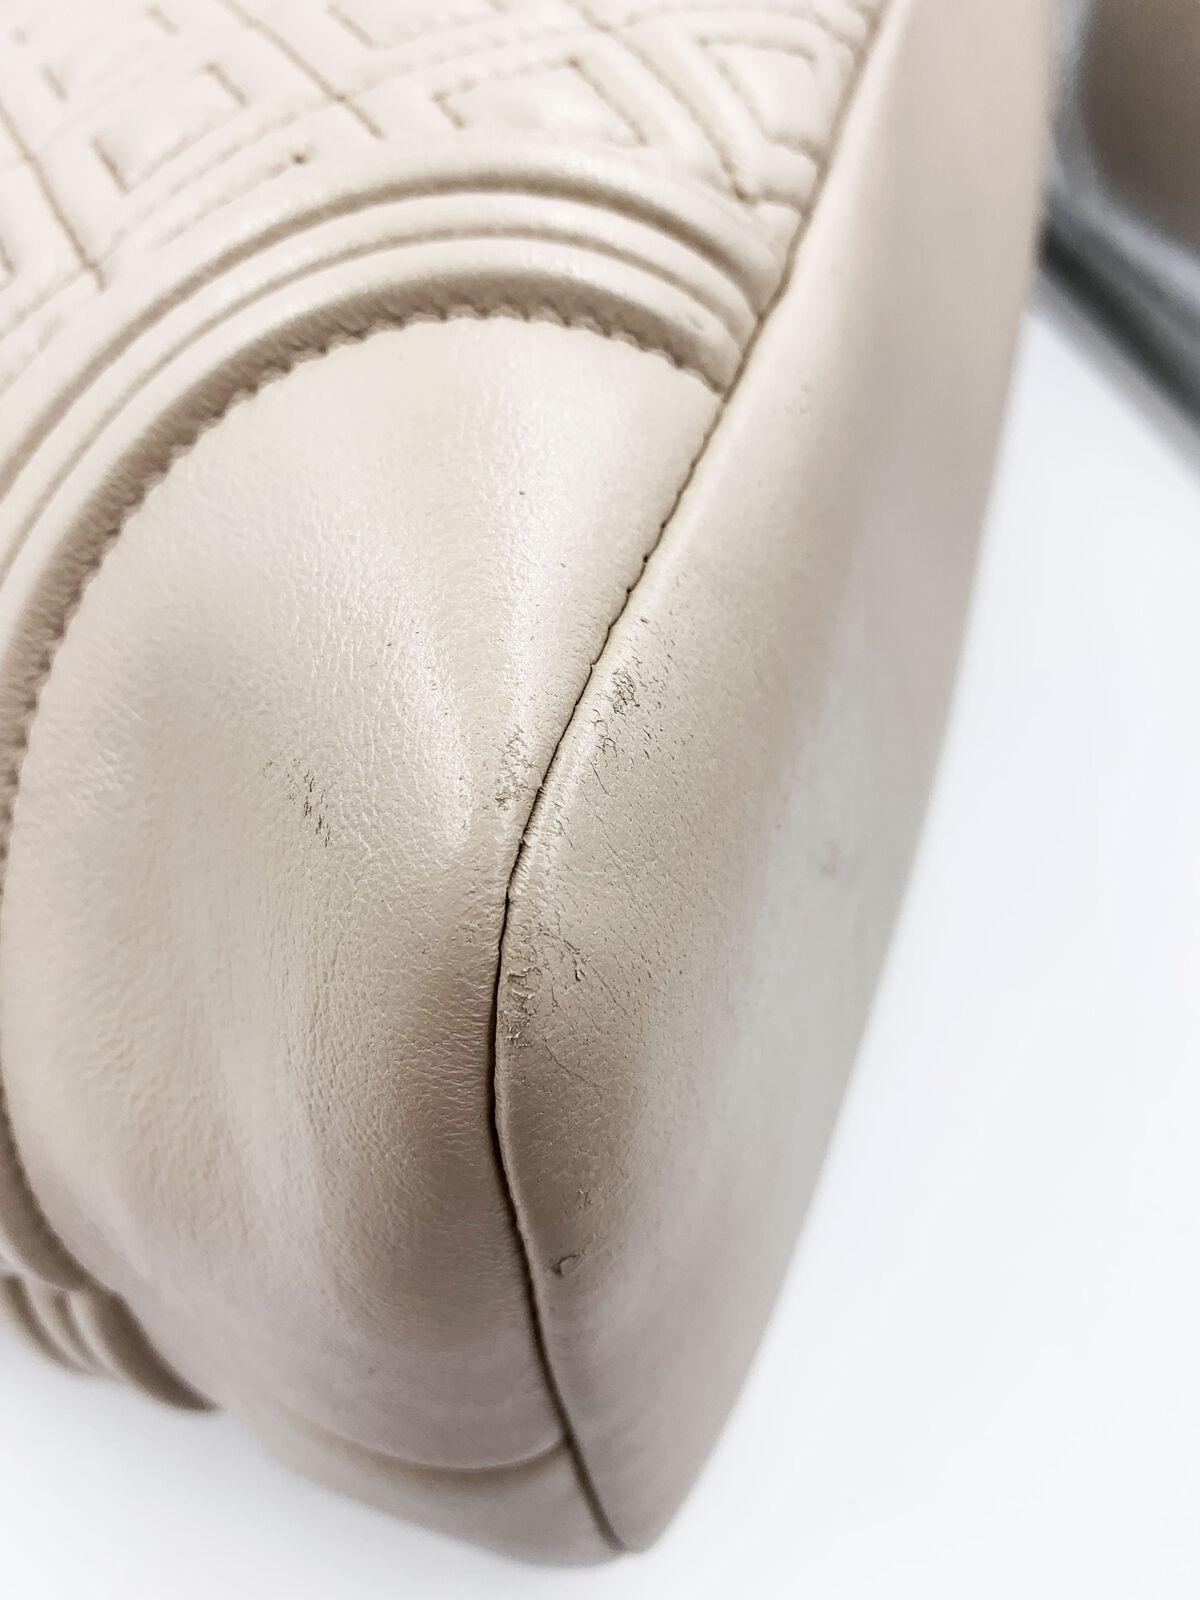 Tory Burch 31426 Fleming Tote Lambskin Leather Large Women's Bag